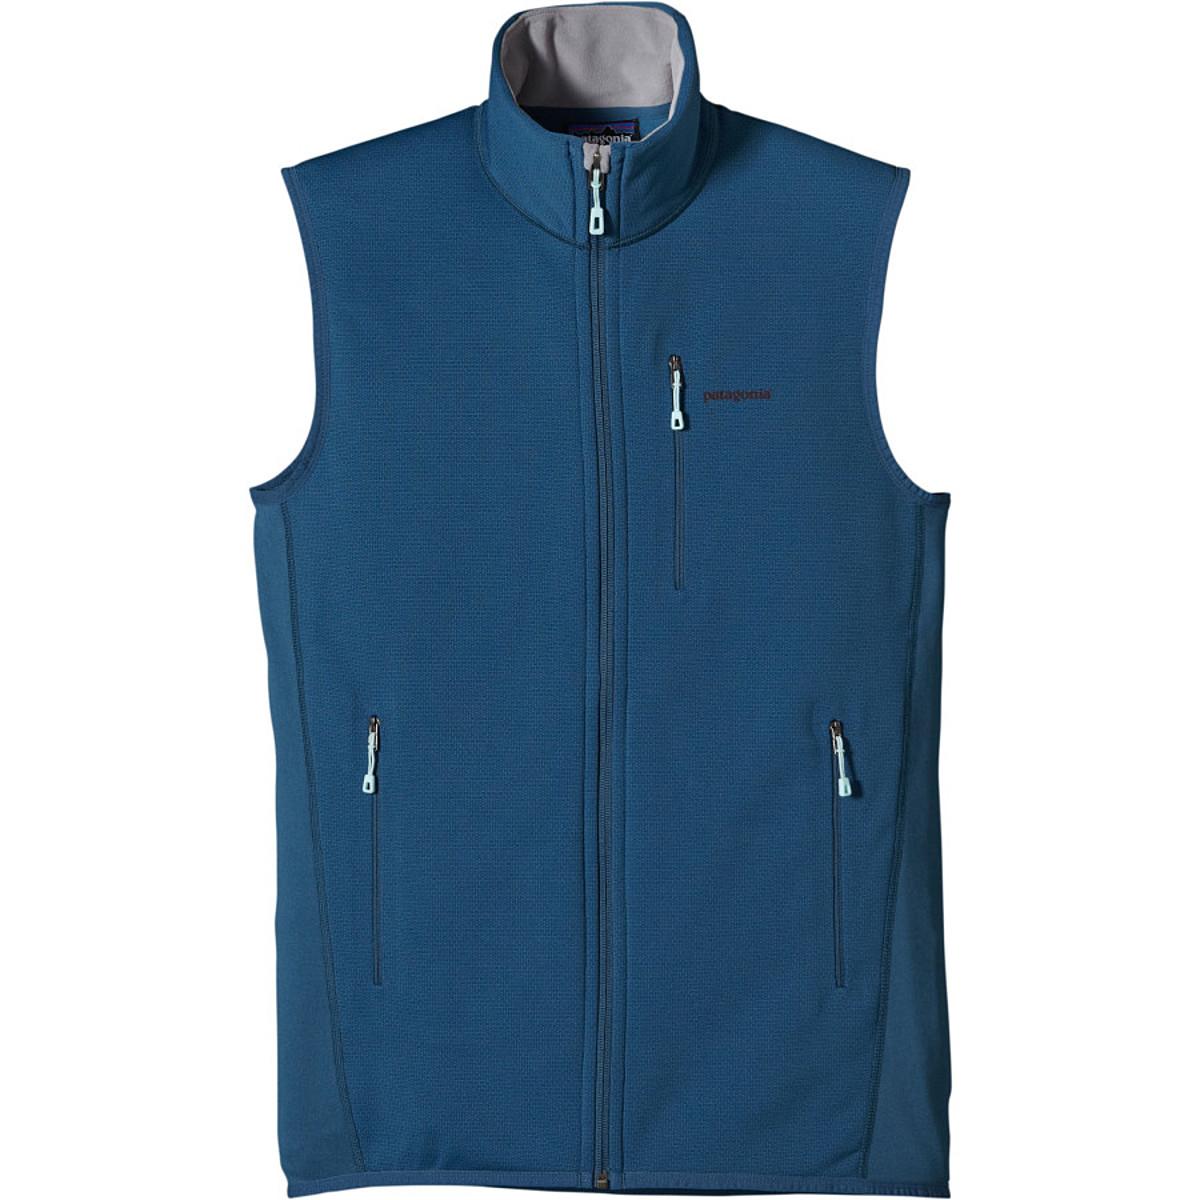 Patagonia Piton Hybrid Vest